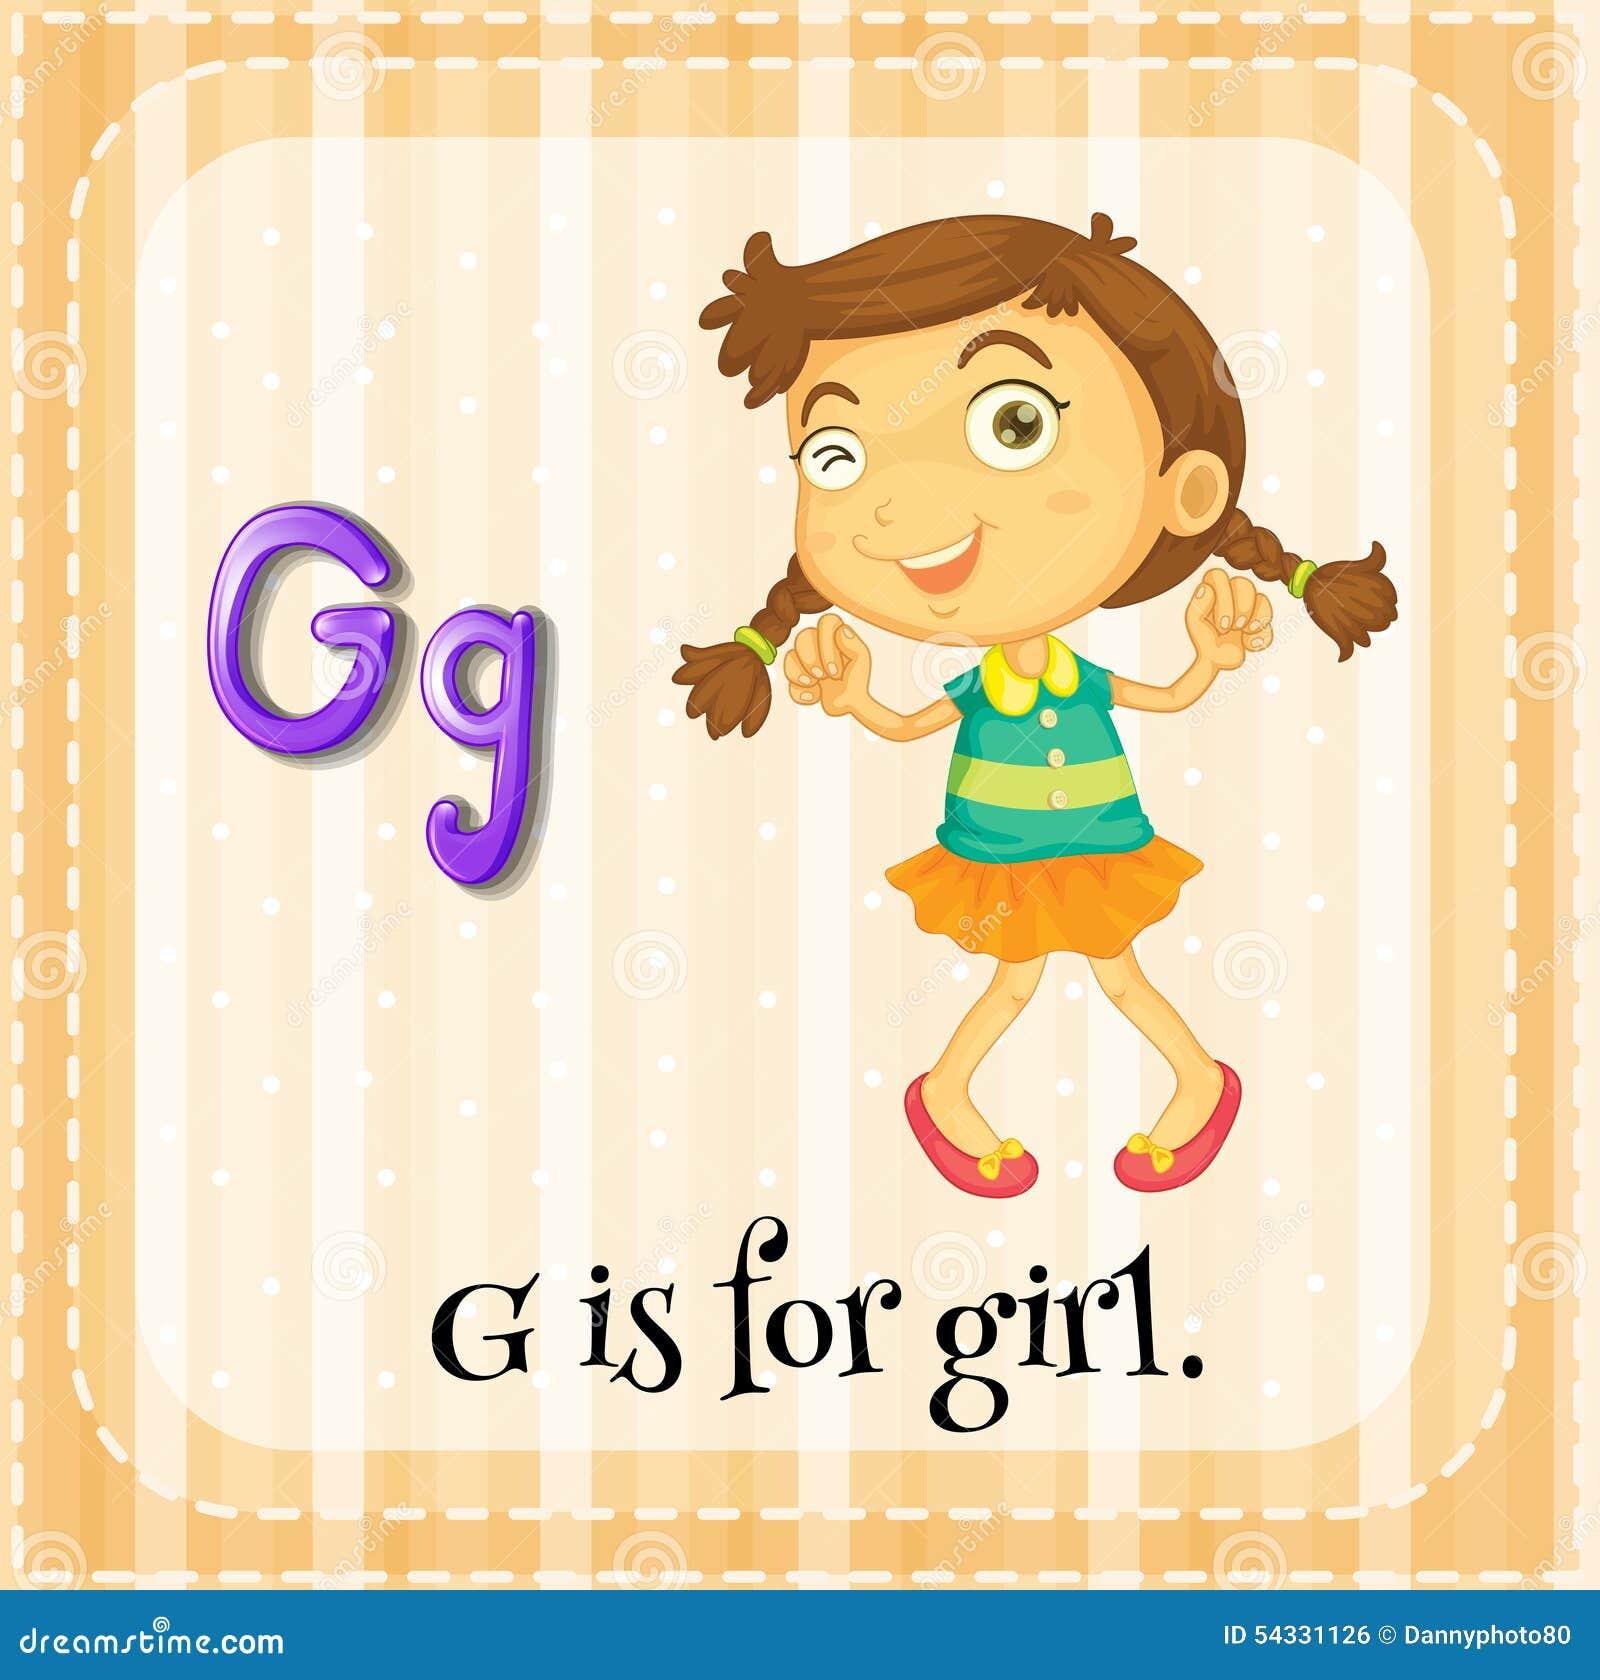 Stock Illustration Letter G Flashcard Girl Image54331126 on Airplane Worksheets